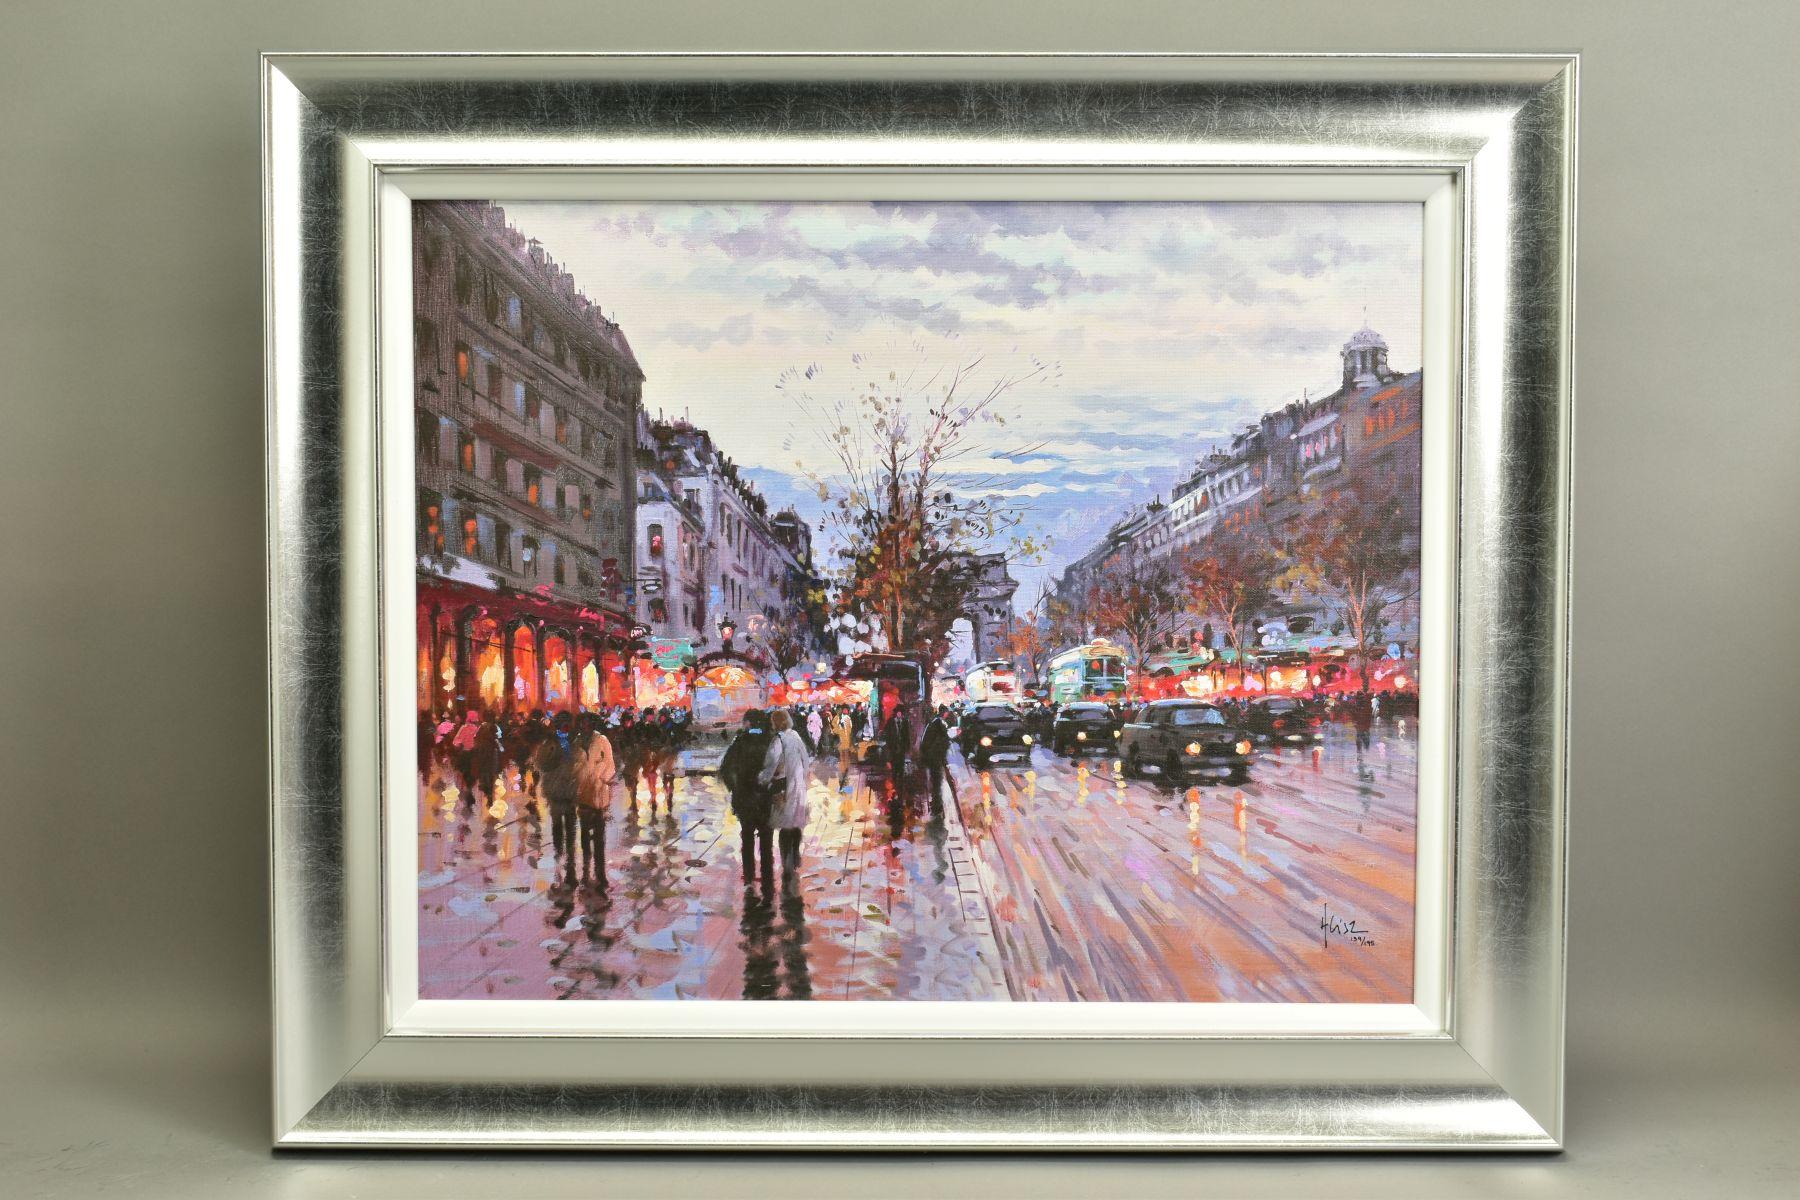 HENDERSON CISZ (BRAZIL 1960), 'Romance in Paris', a Limited Edition print of a Parsian street scene,